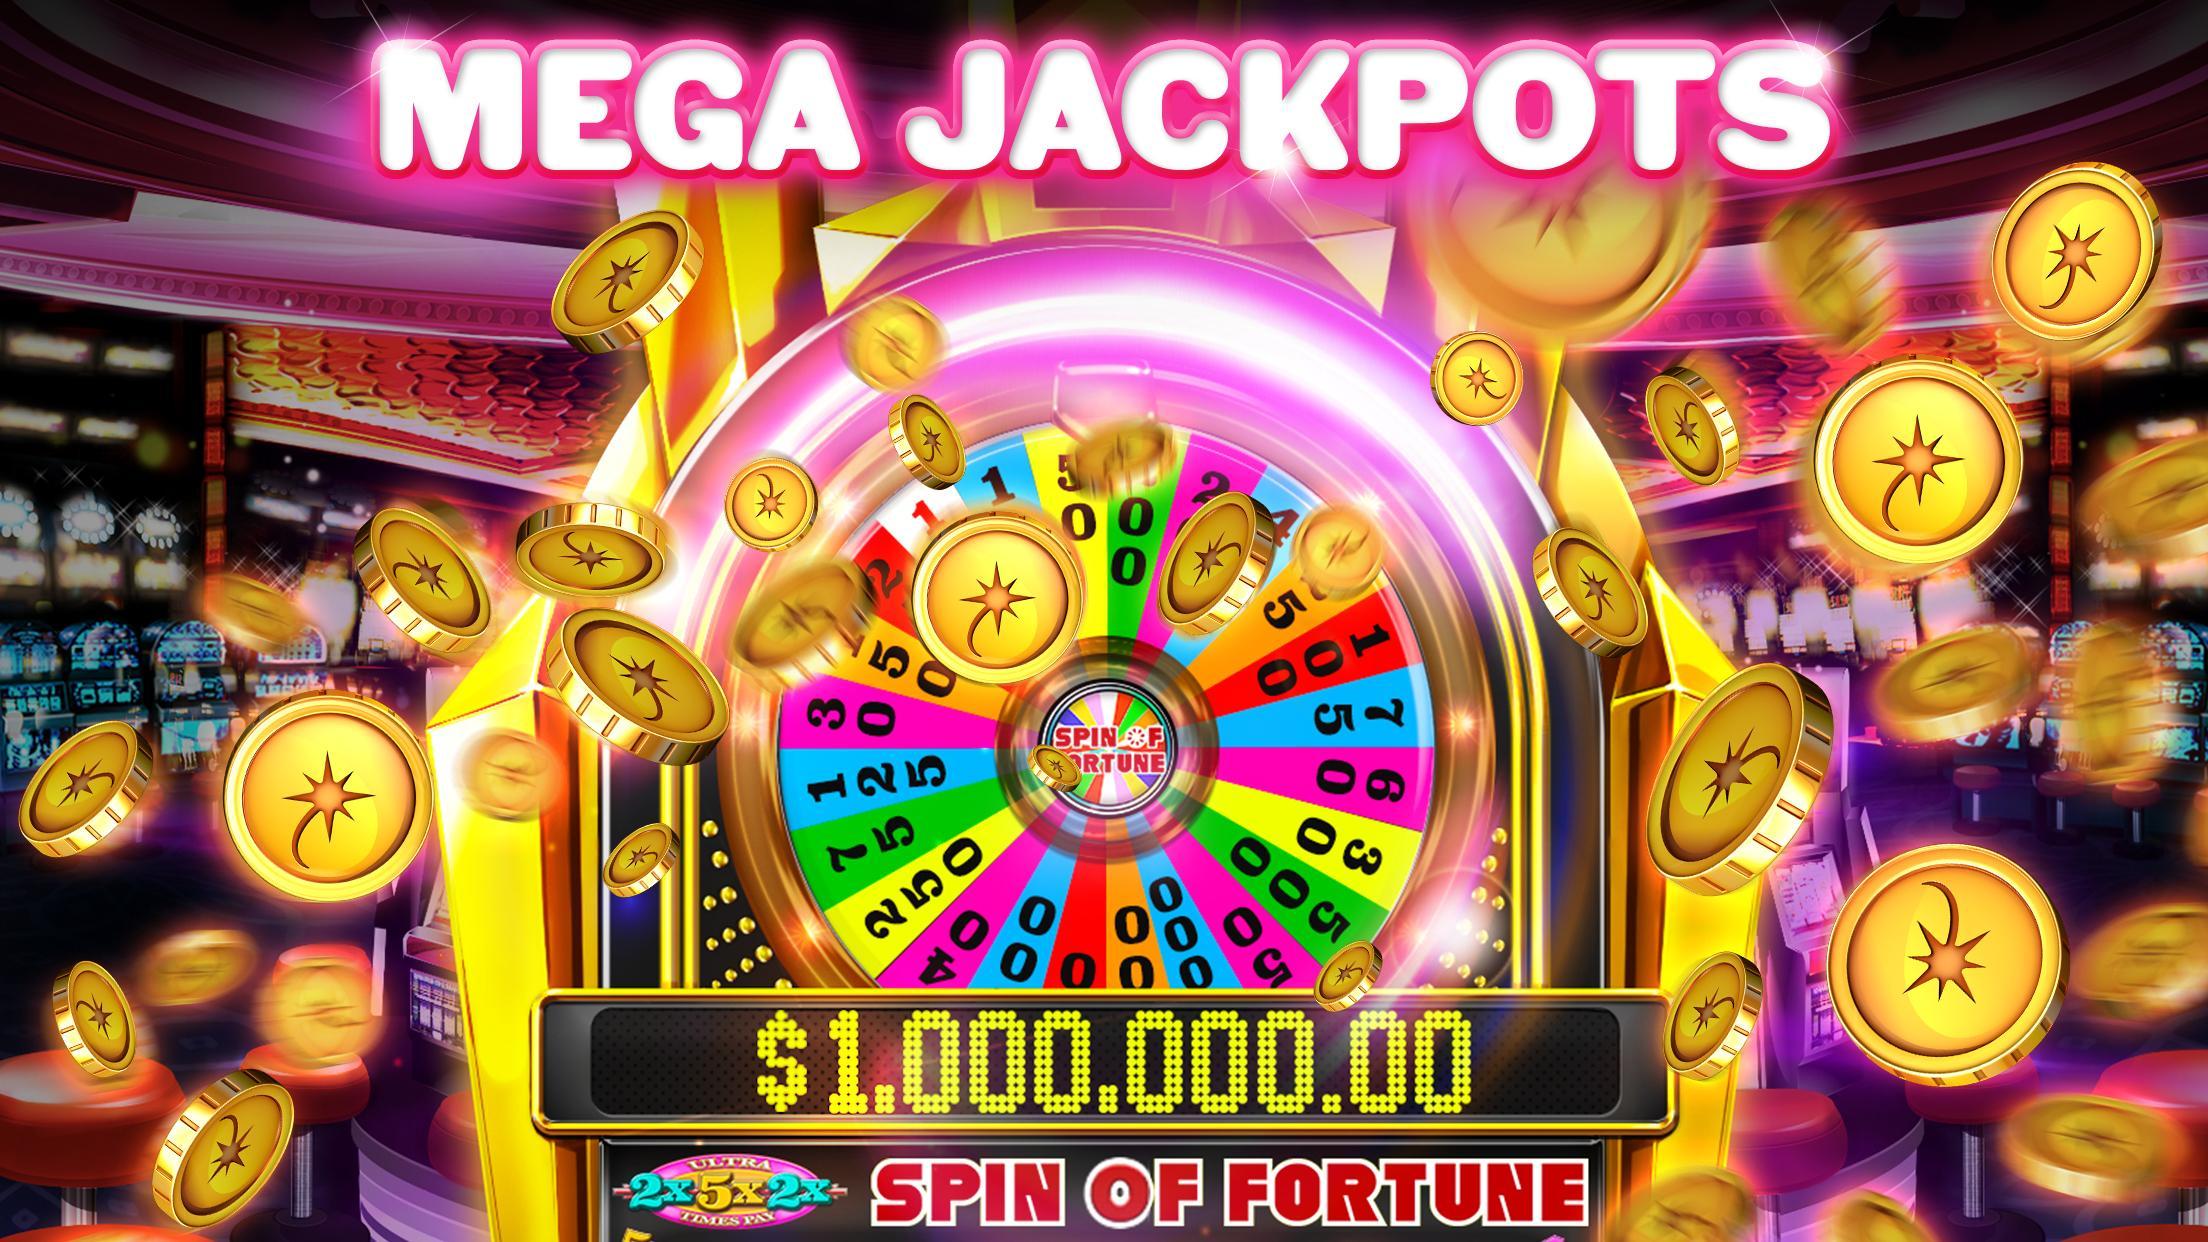 Jackpotjoy Slots Slot machines with Bonus Games 26.0.05 Screenshot 11